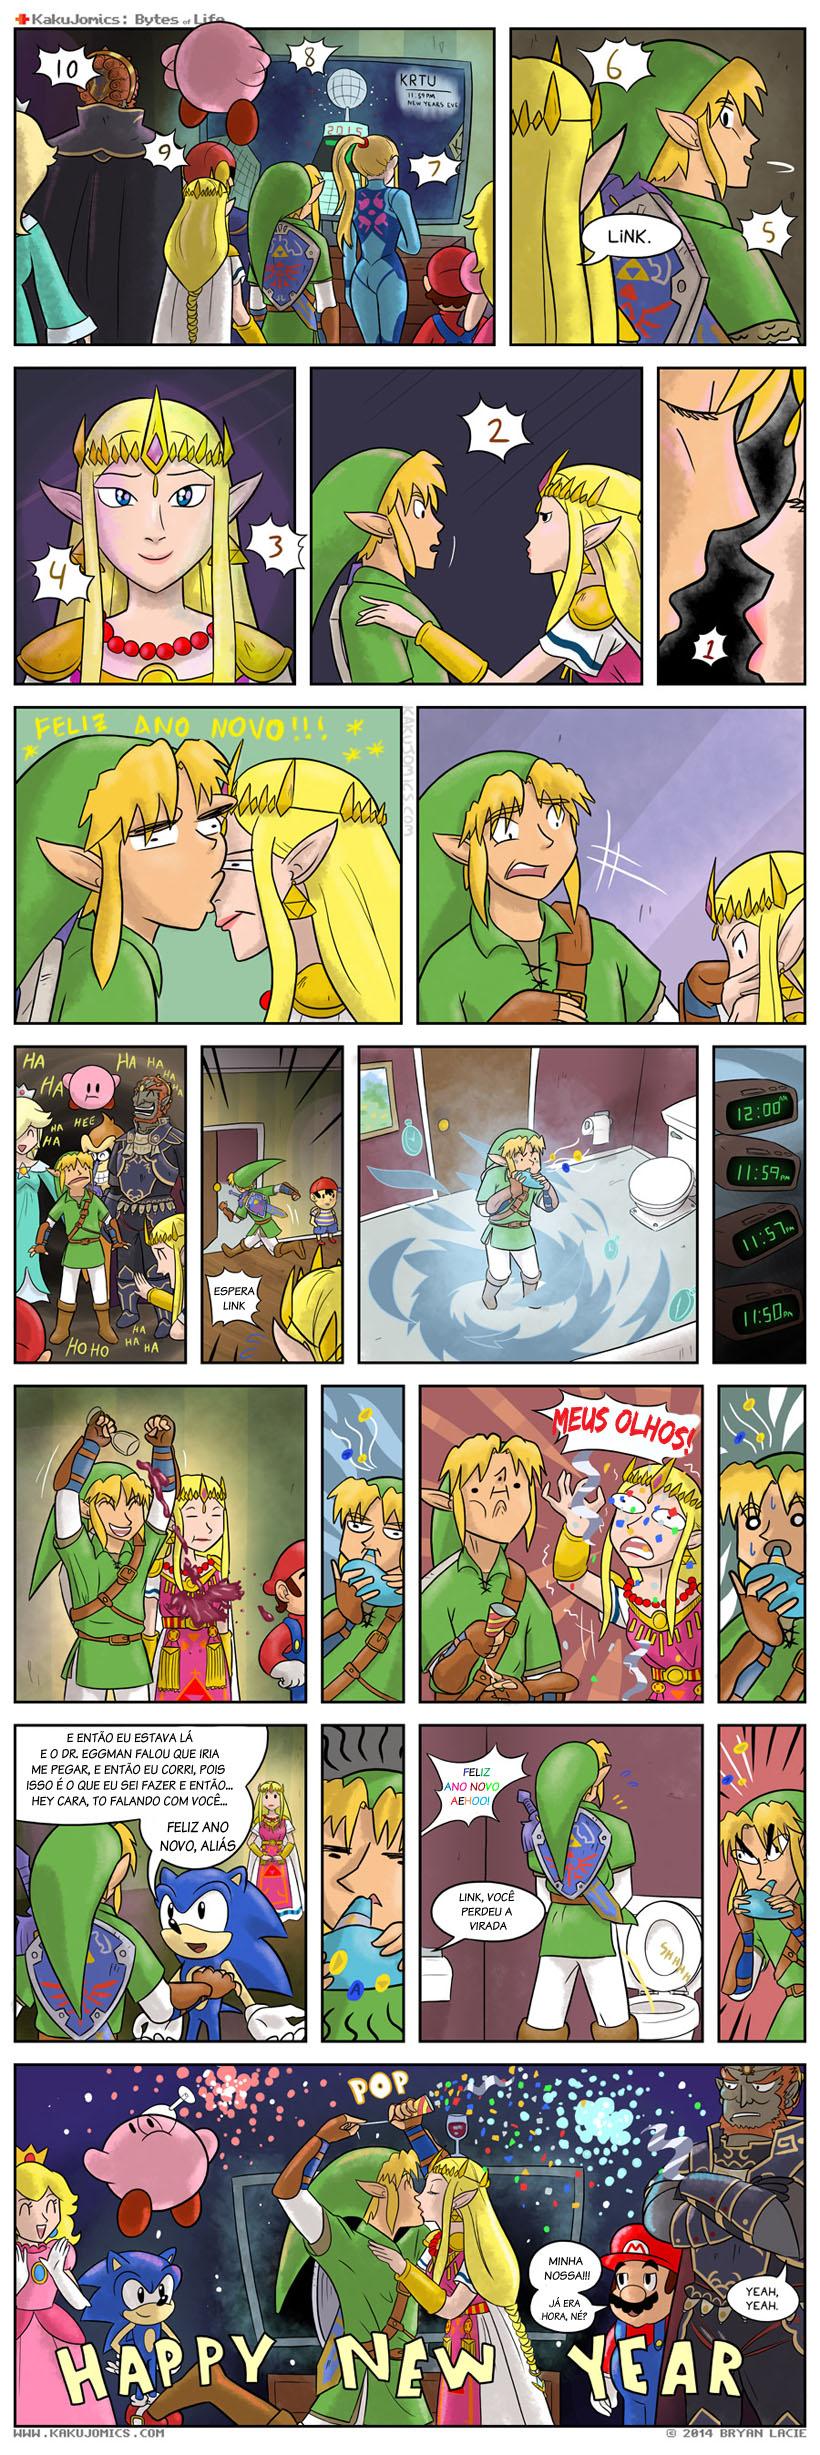 Link feliz ano novo